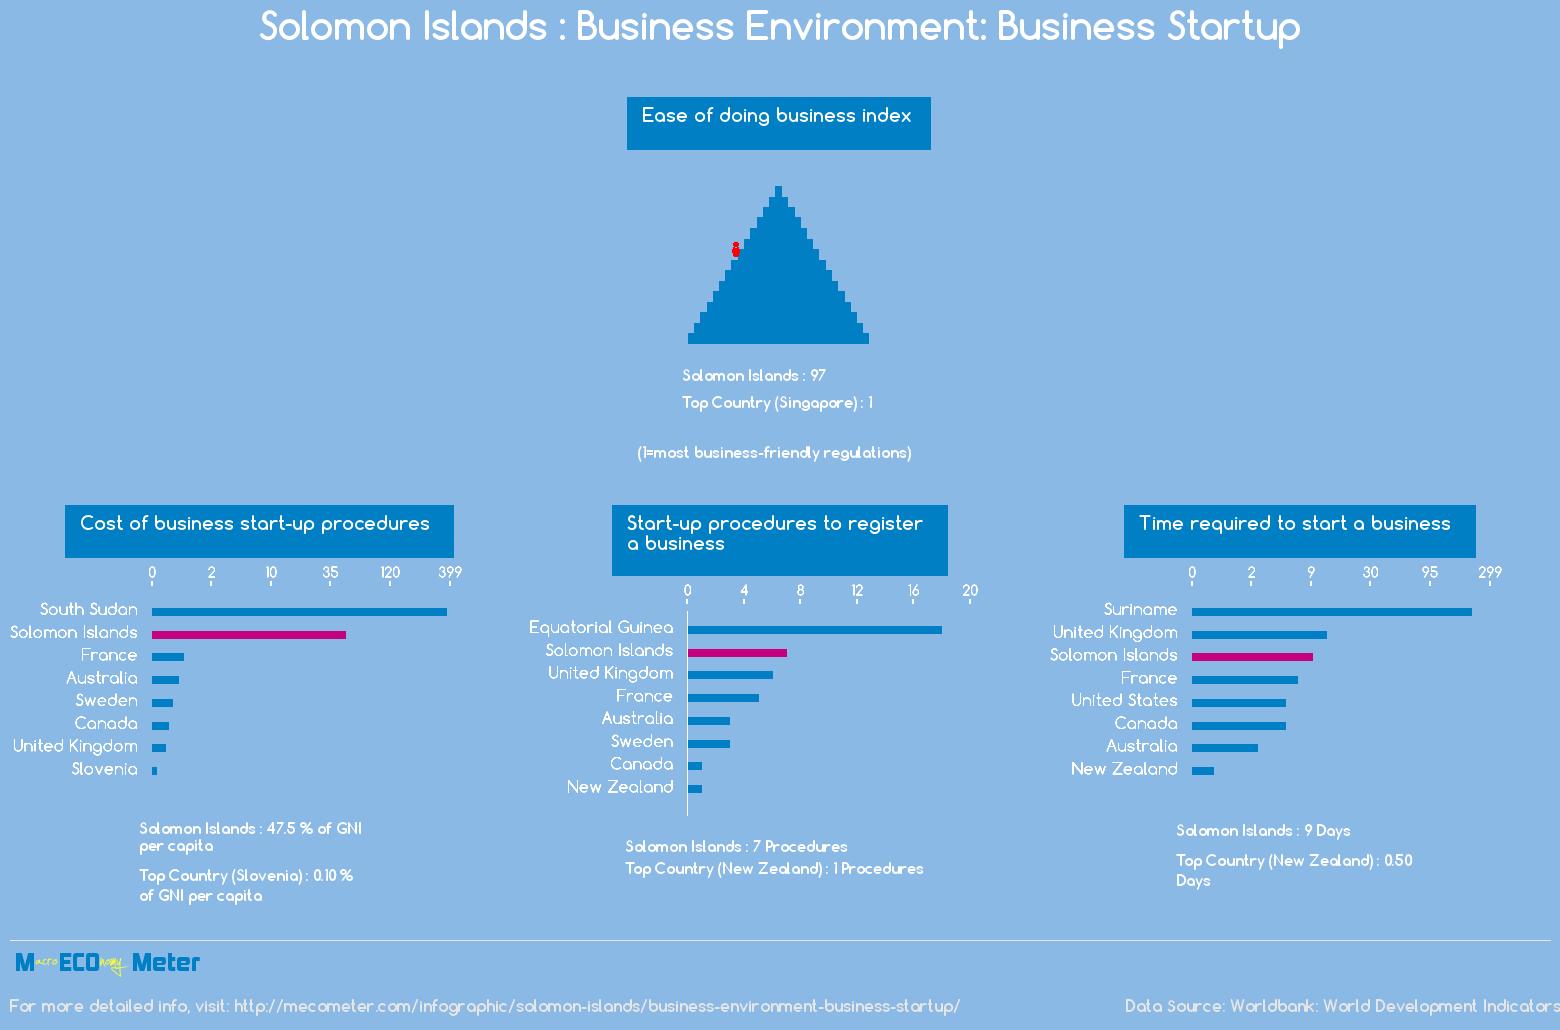 Solomon Islands : Business Environment: Business Startup